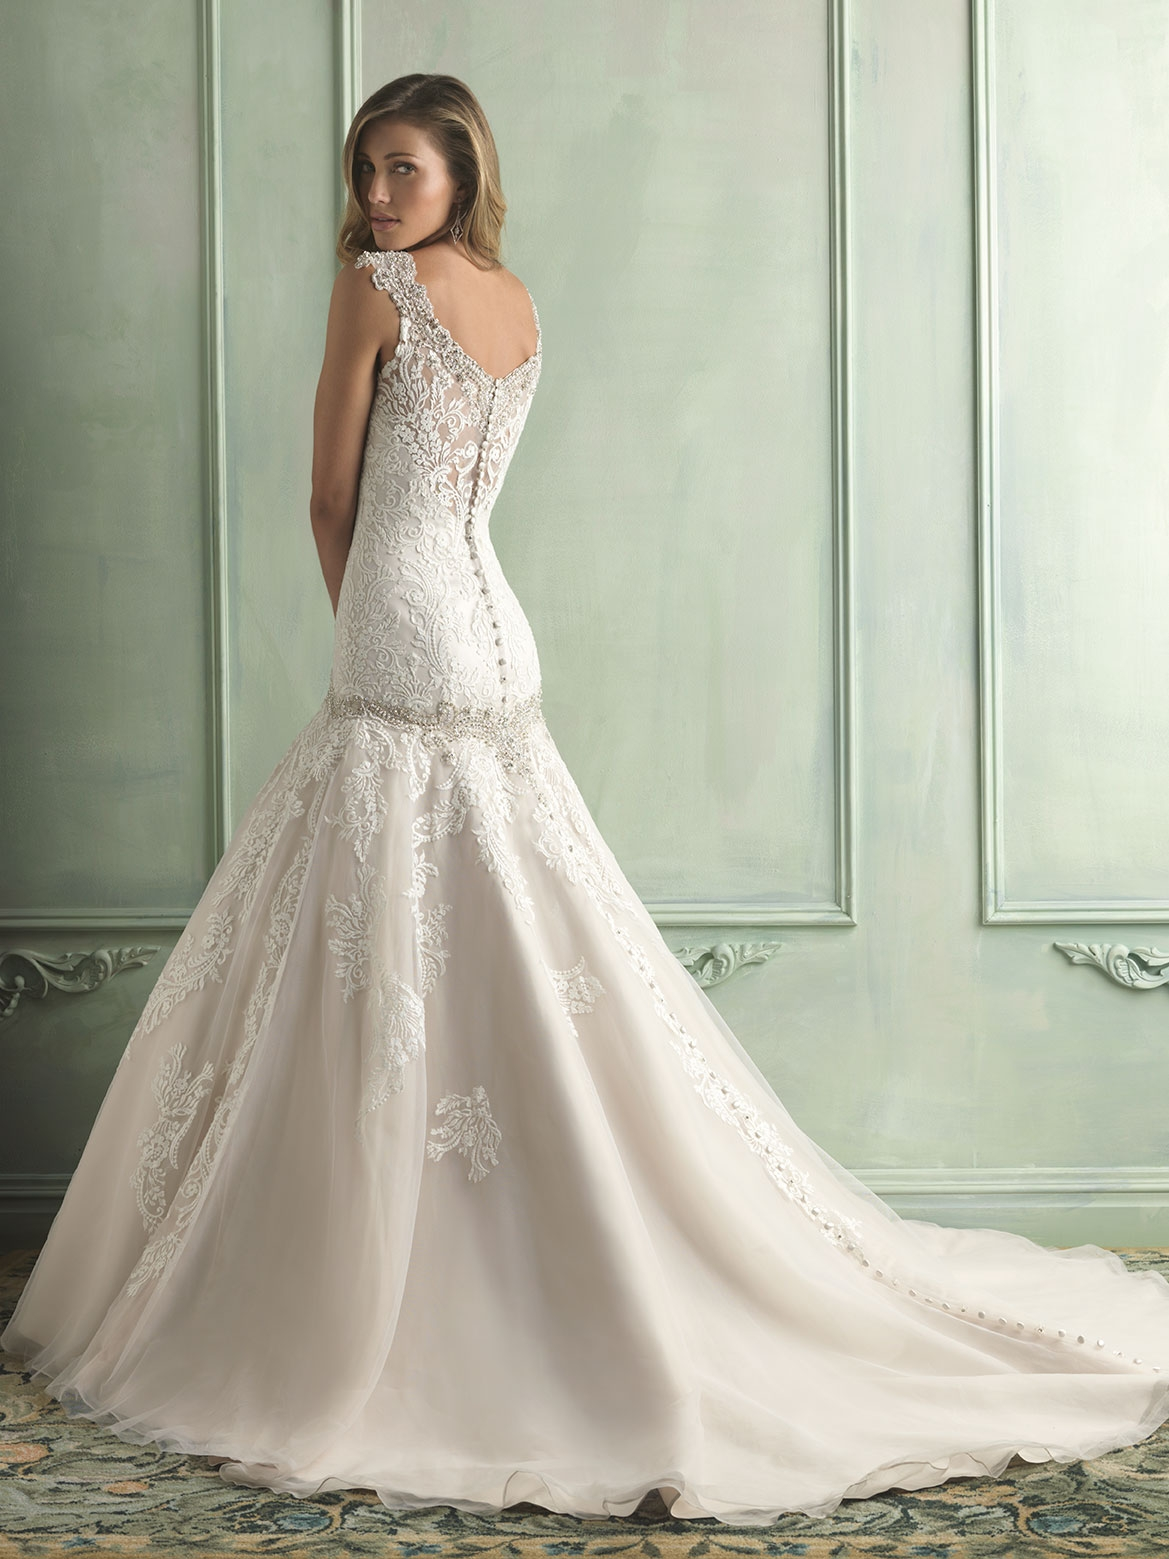 Allure Bridal 9127 - Couture Bridal